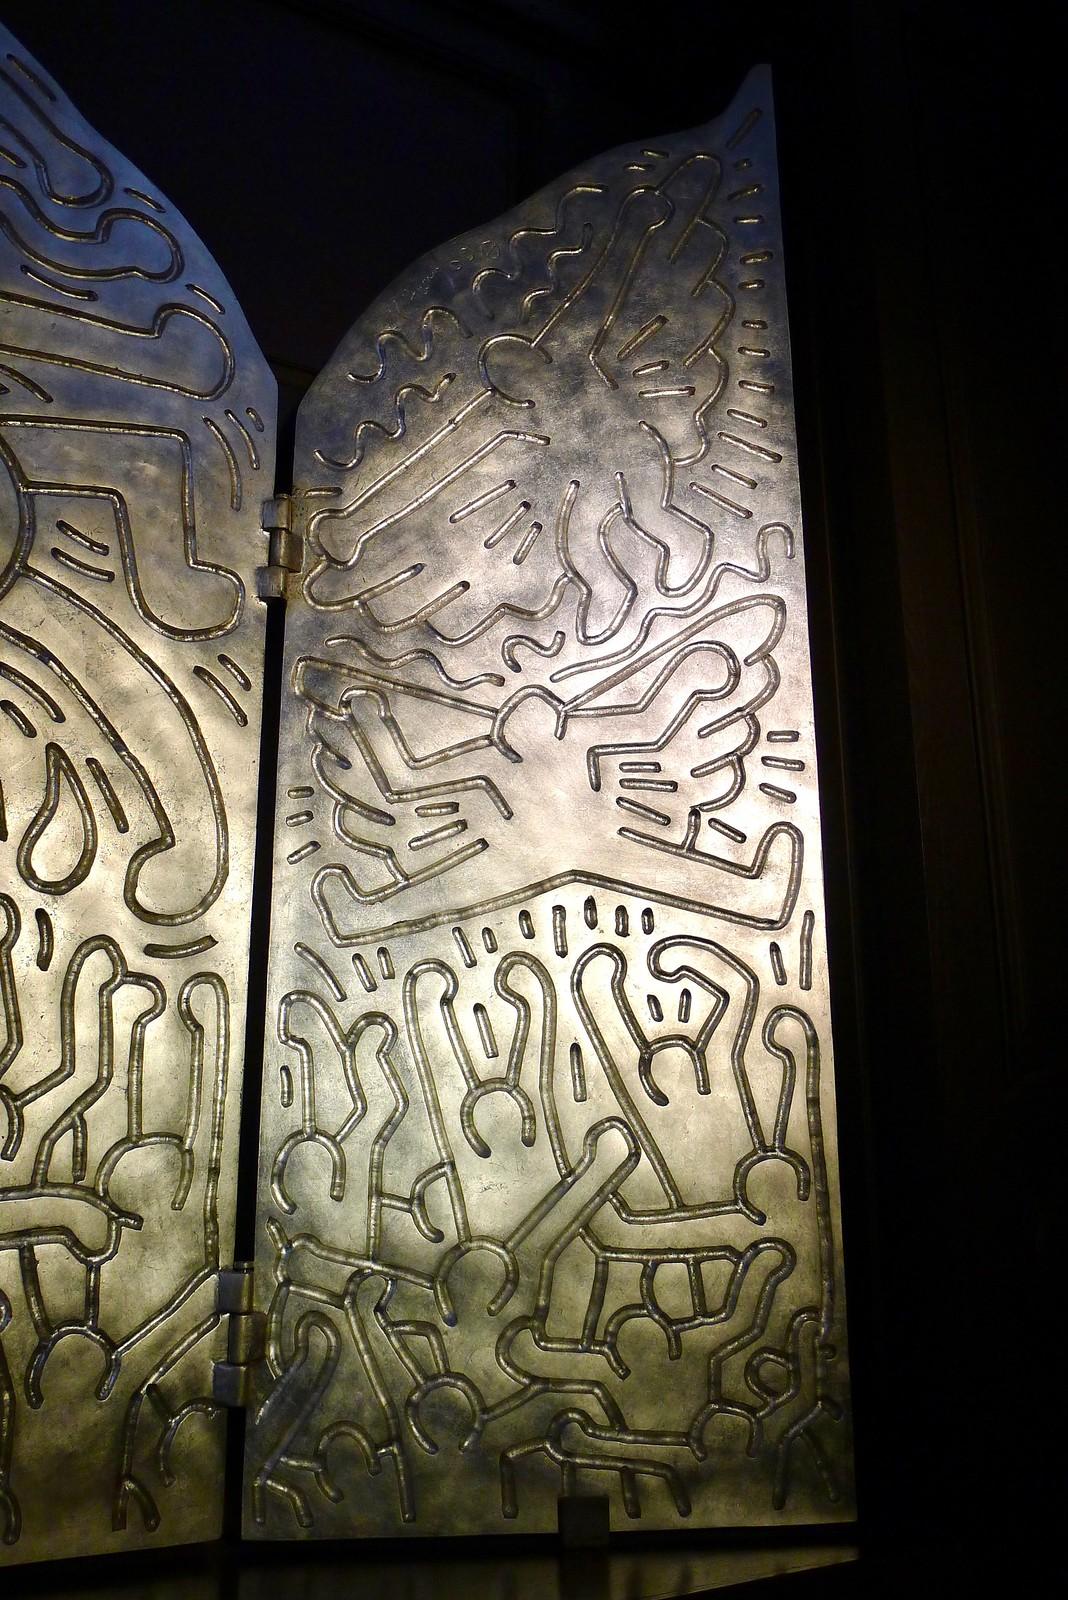 Keith Haring, Paris